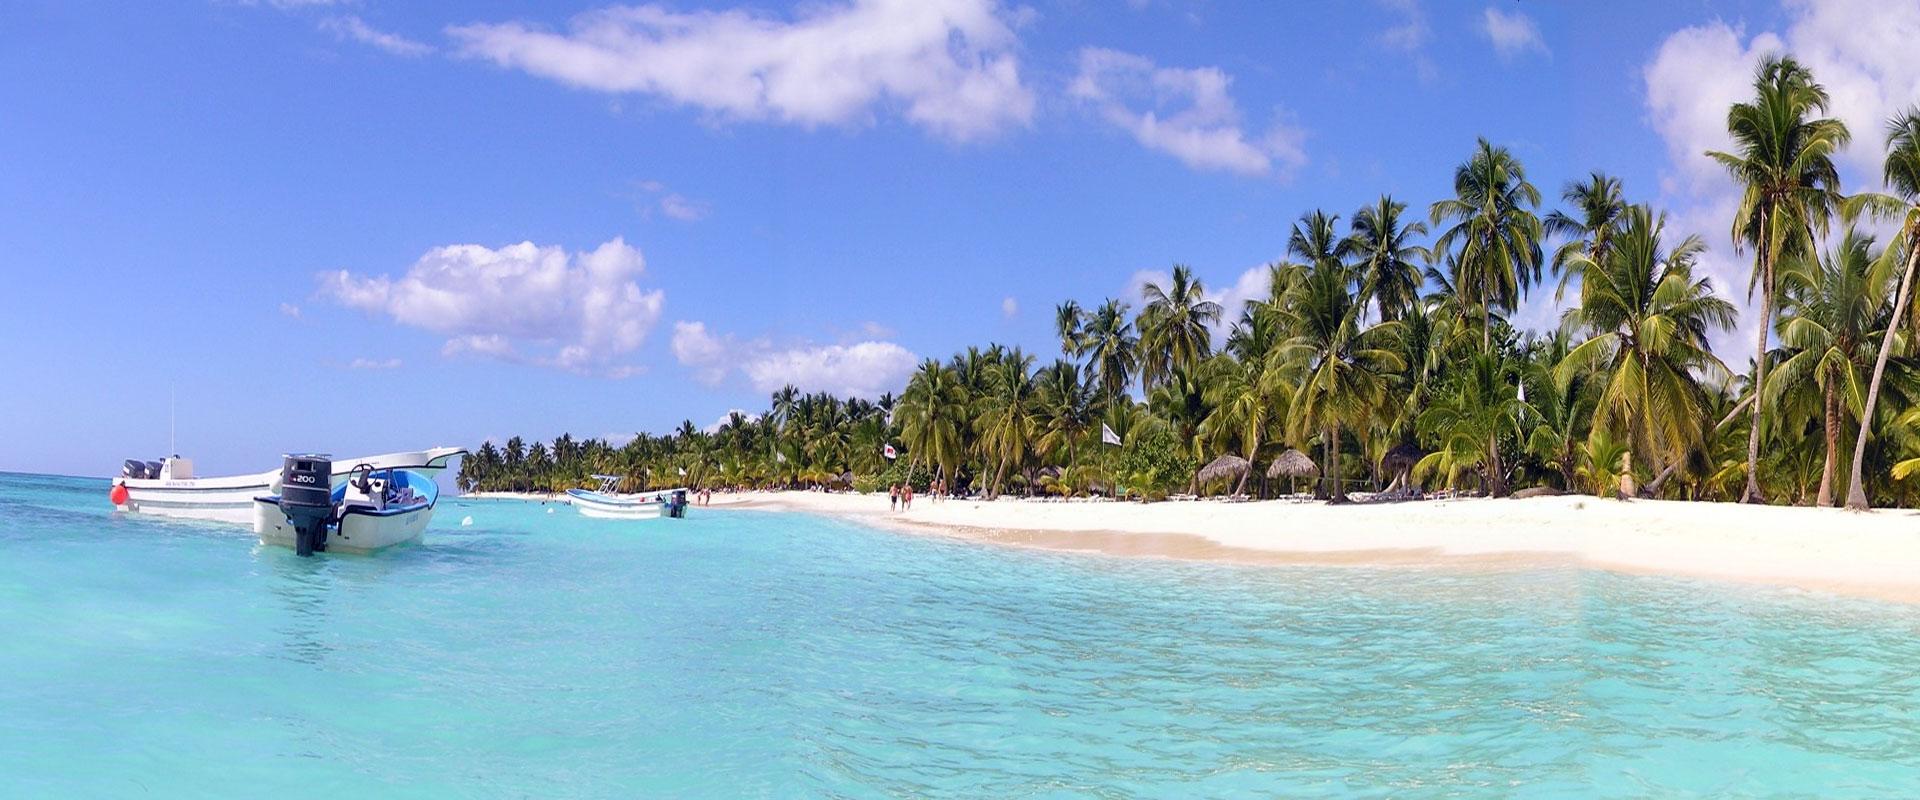 Saona Island Private Tour